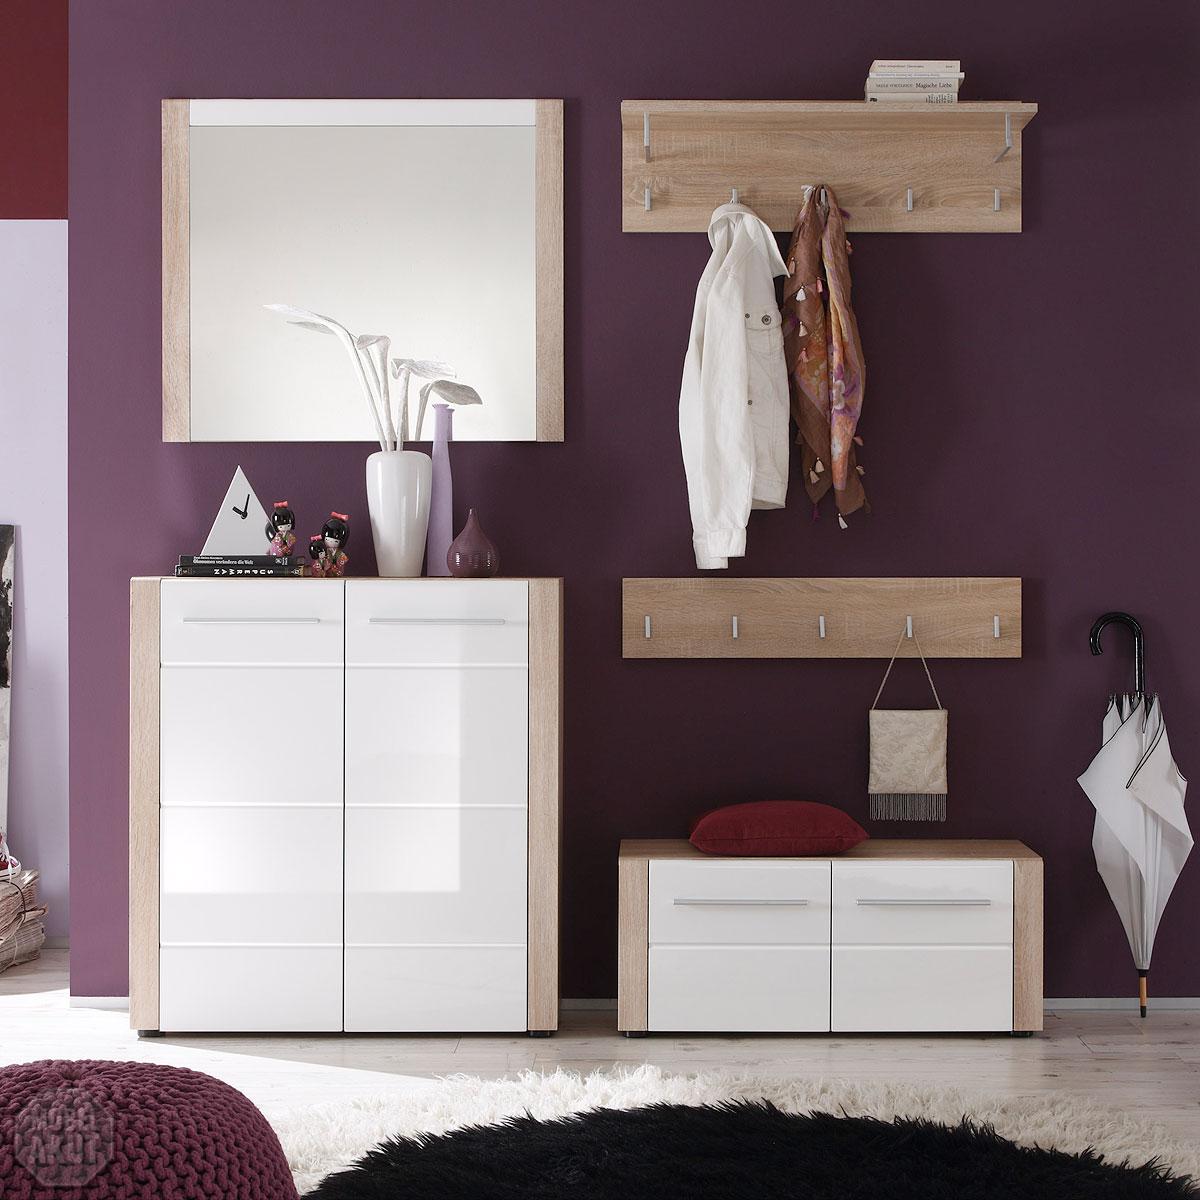 garderobenset ii tila garderobe schuhschrank sonoma eiche s gerau wei hochglanz ebay. Black Bedroom Furniture Sets. Home Design Ideas